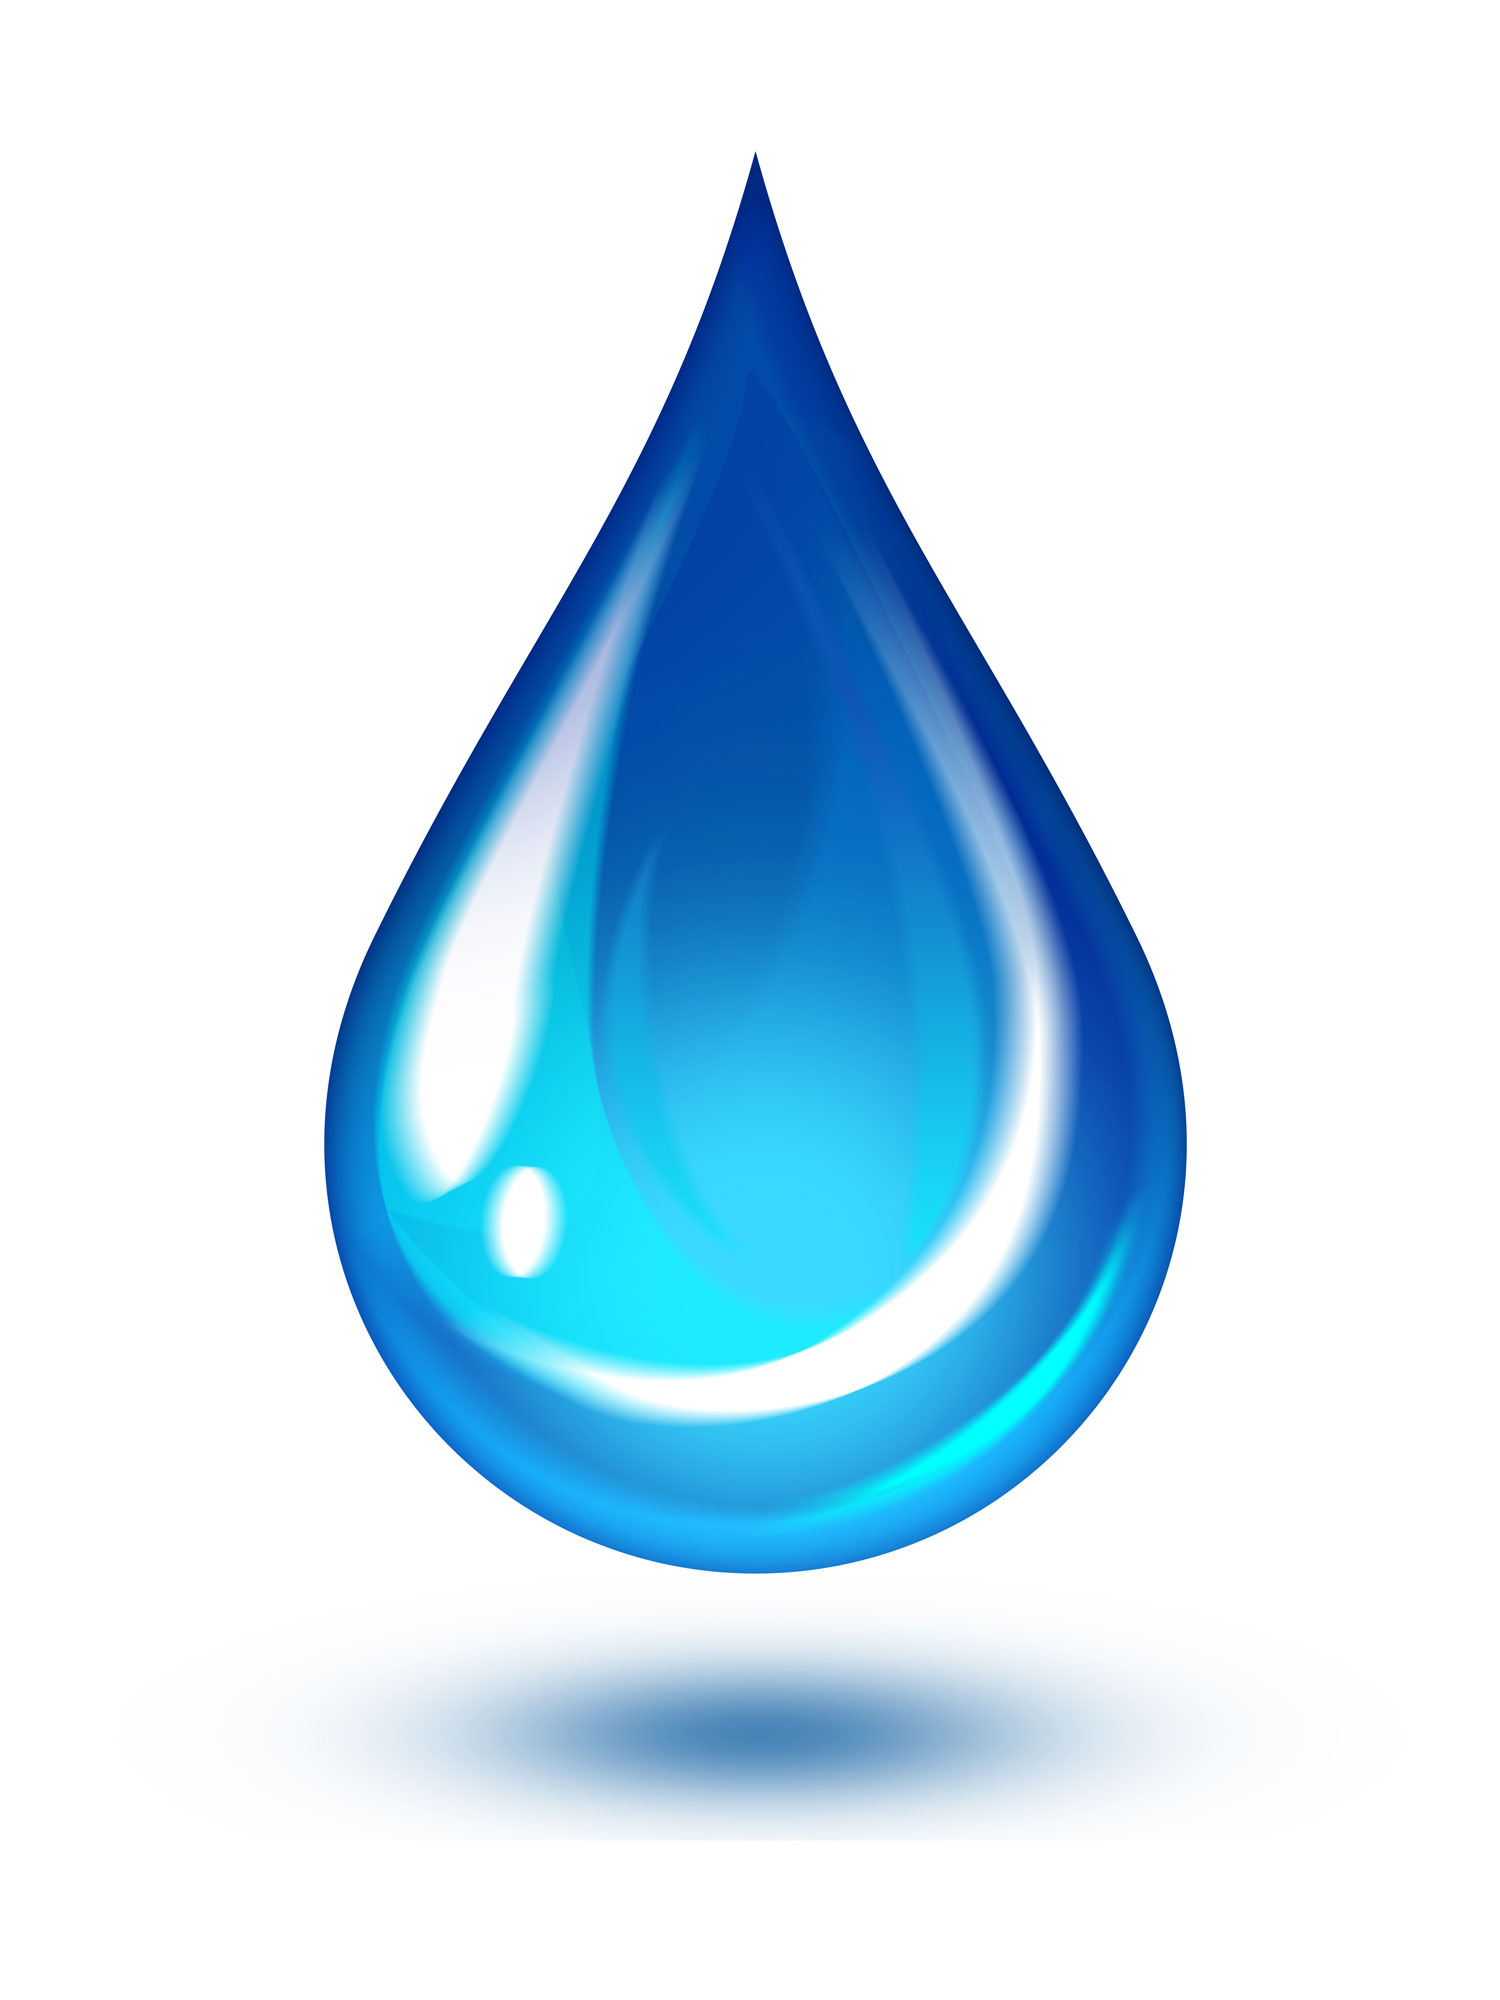 Water Drop Clipart - Clipart Kid